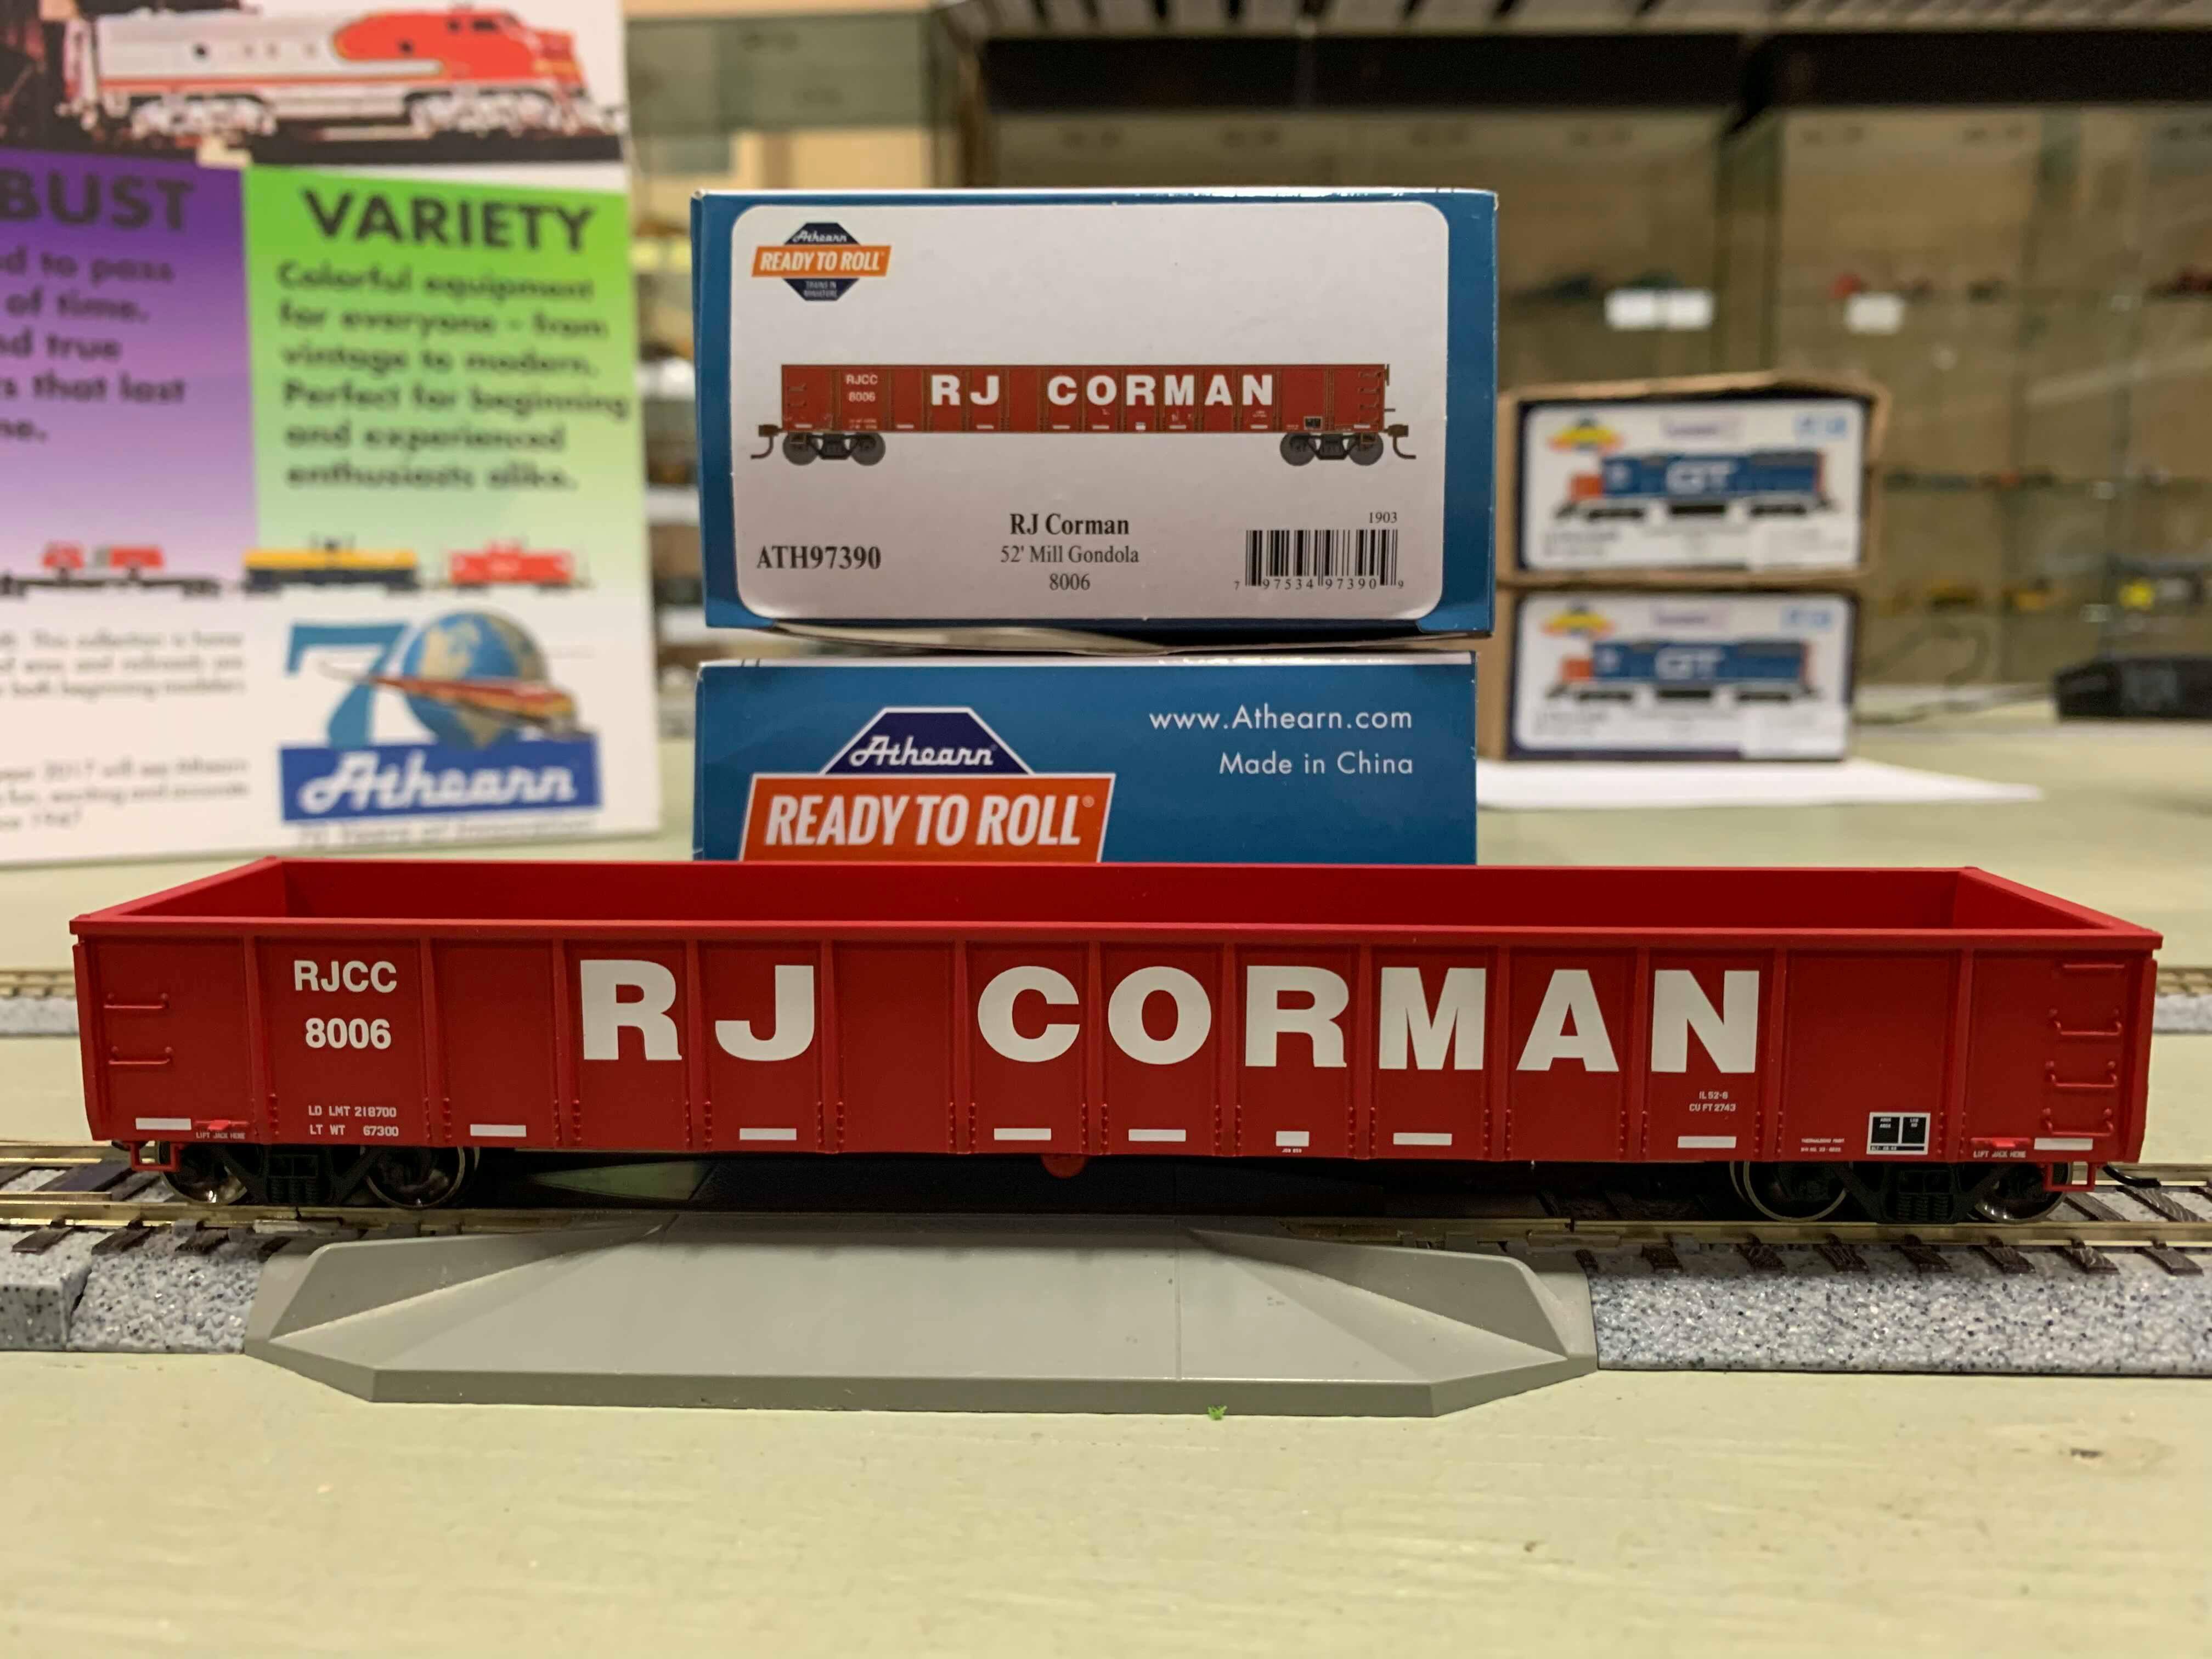 Athearn 97390 HO Scale - RTR 52Ft Mill Gondola, RJCC RJ Corman #8006